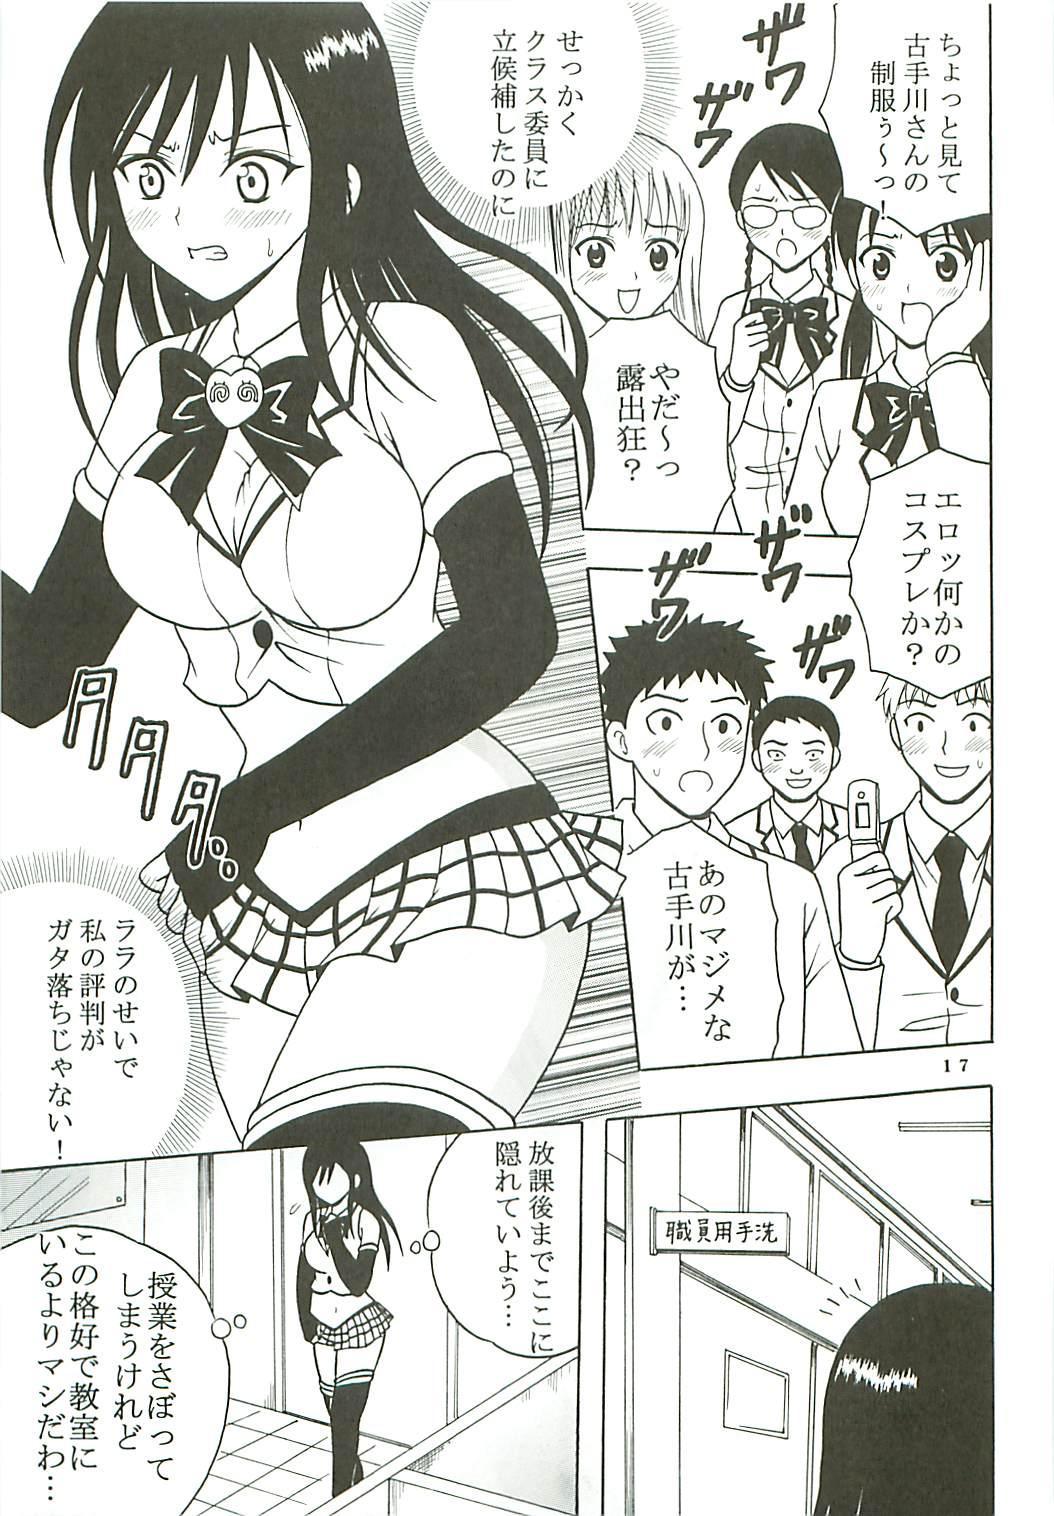 ToLOVE Ryu Vol. 7 17